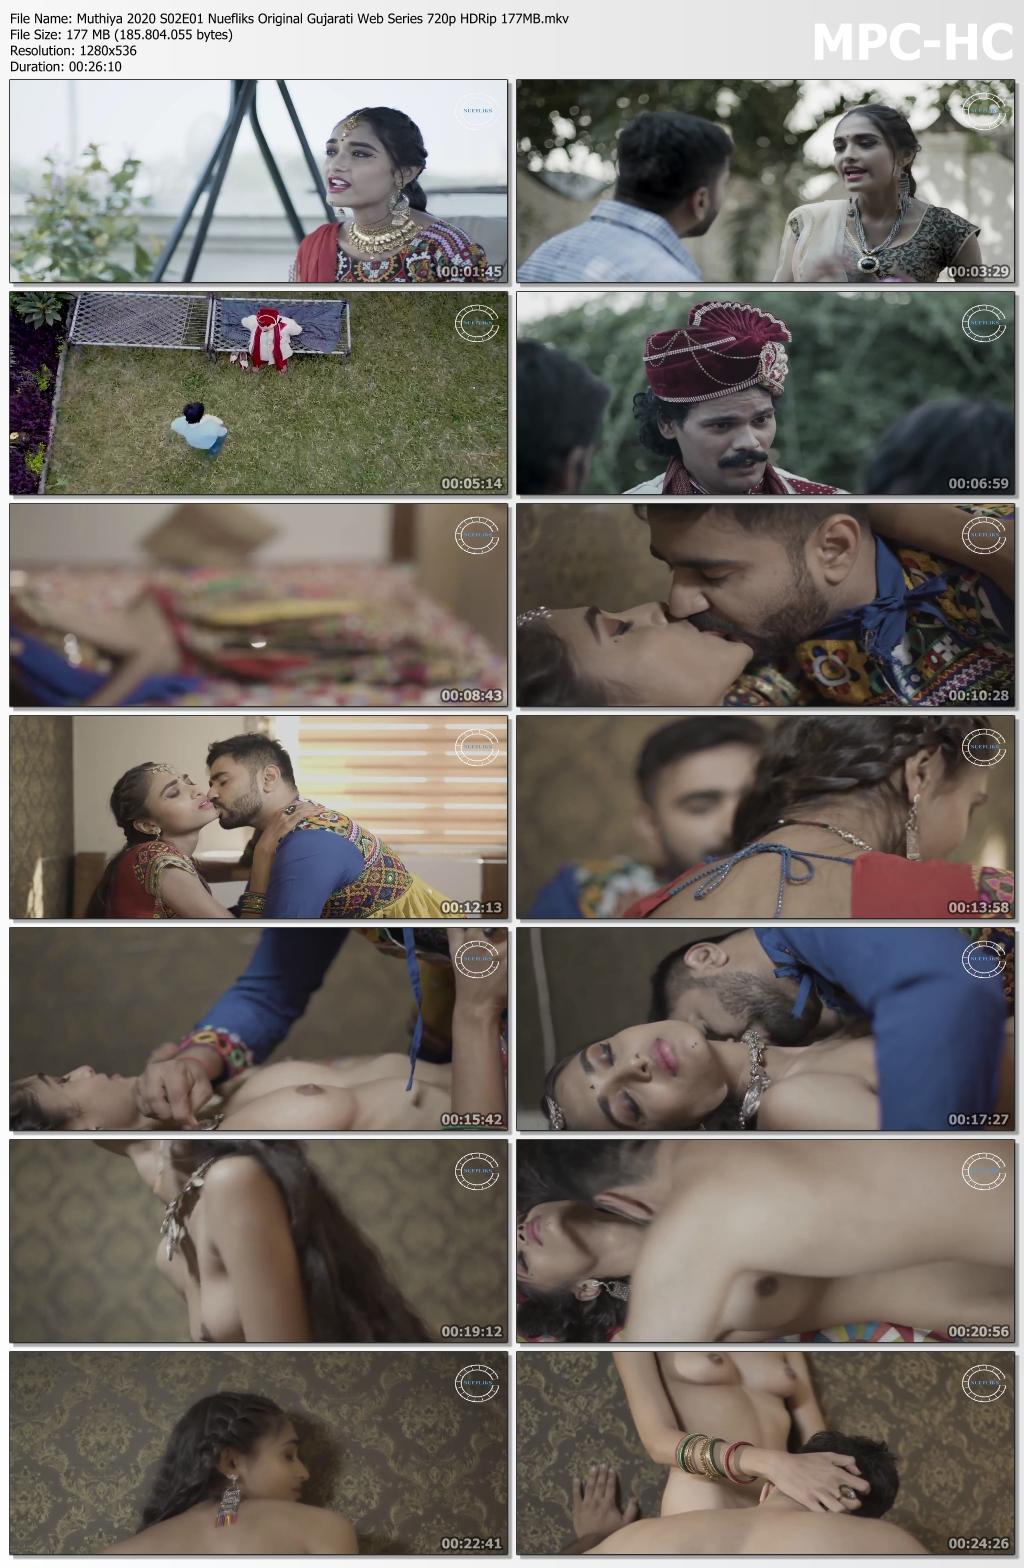 Muthiya-2020-S02-E01-Nuefliks-Original-Gujarati-Web-Series-720p-HDRip-177-MB-mkv-thumbs